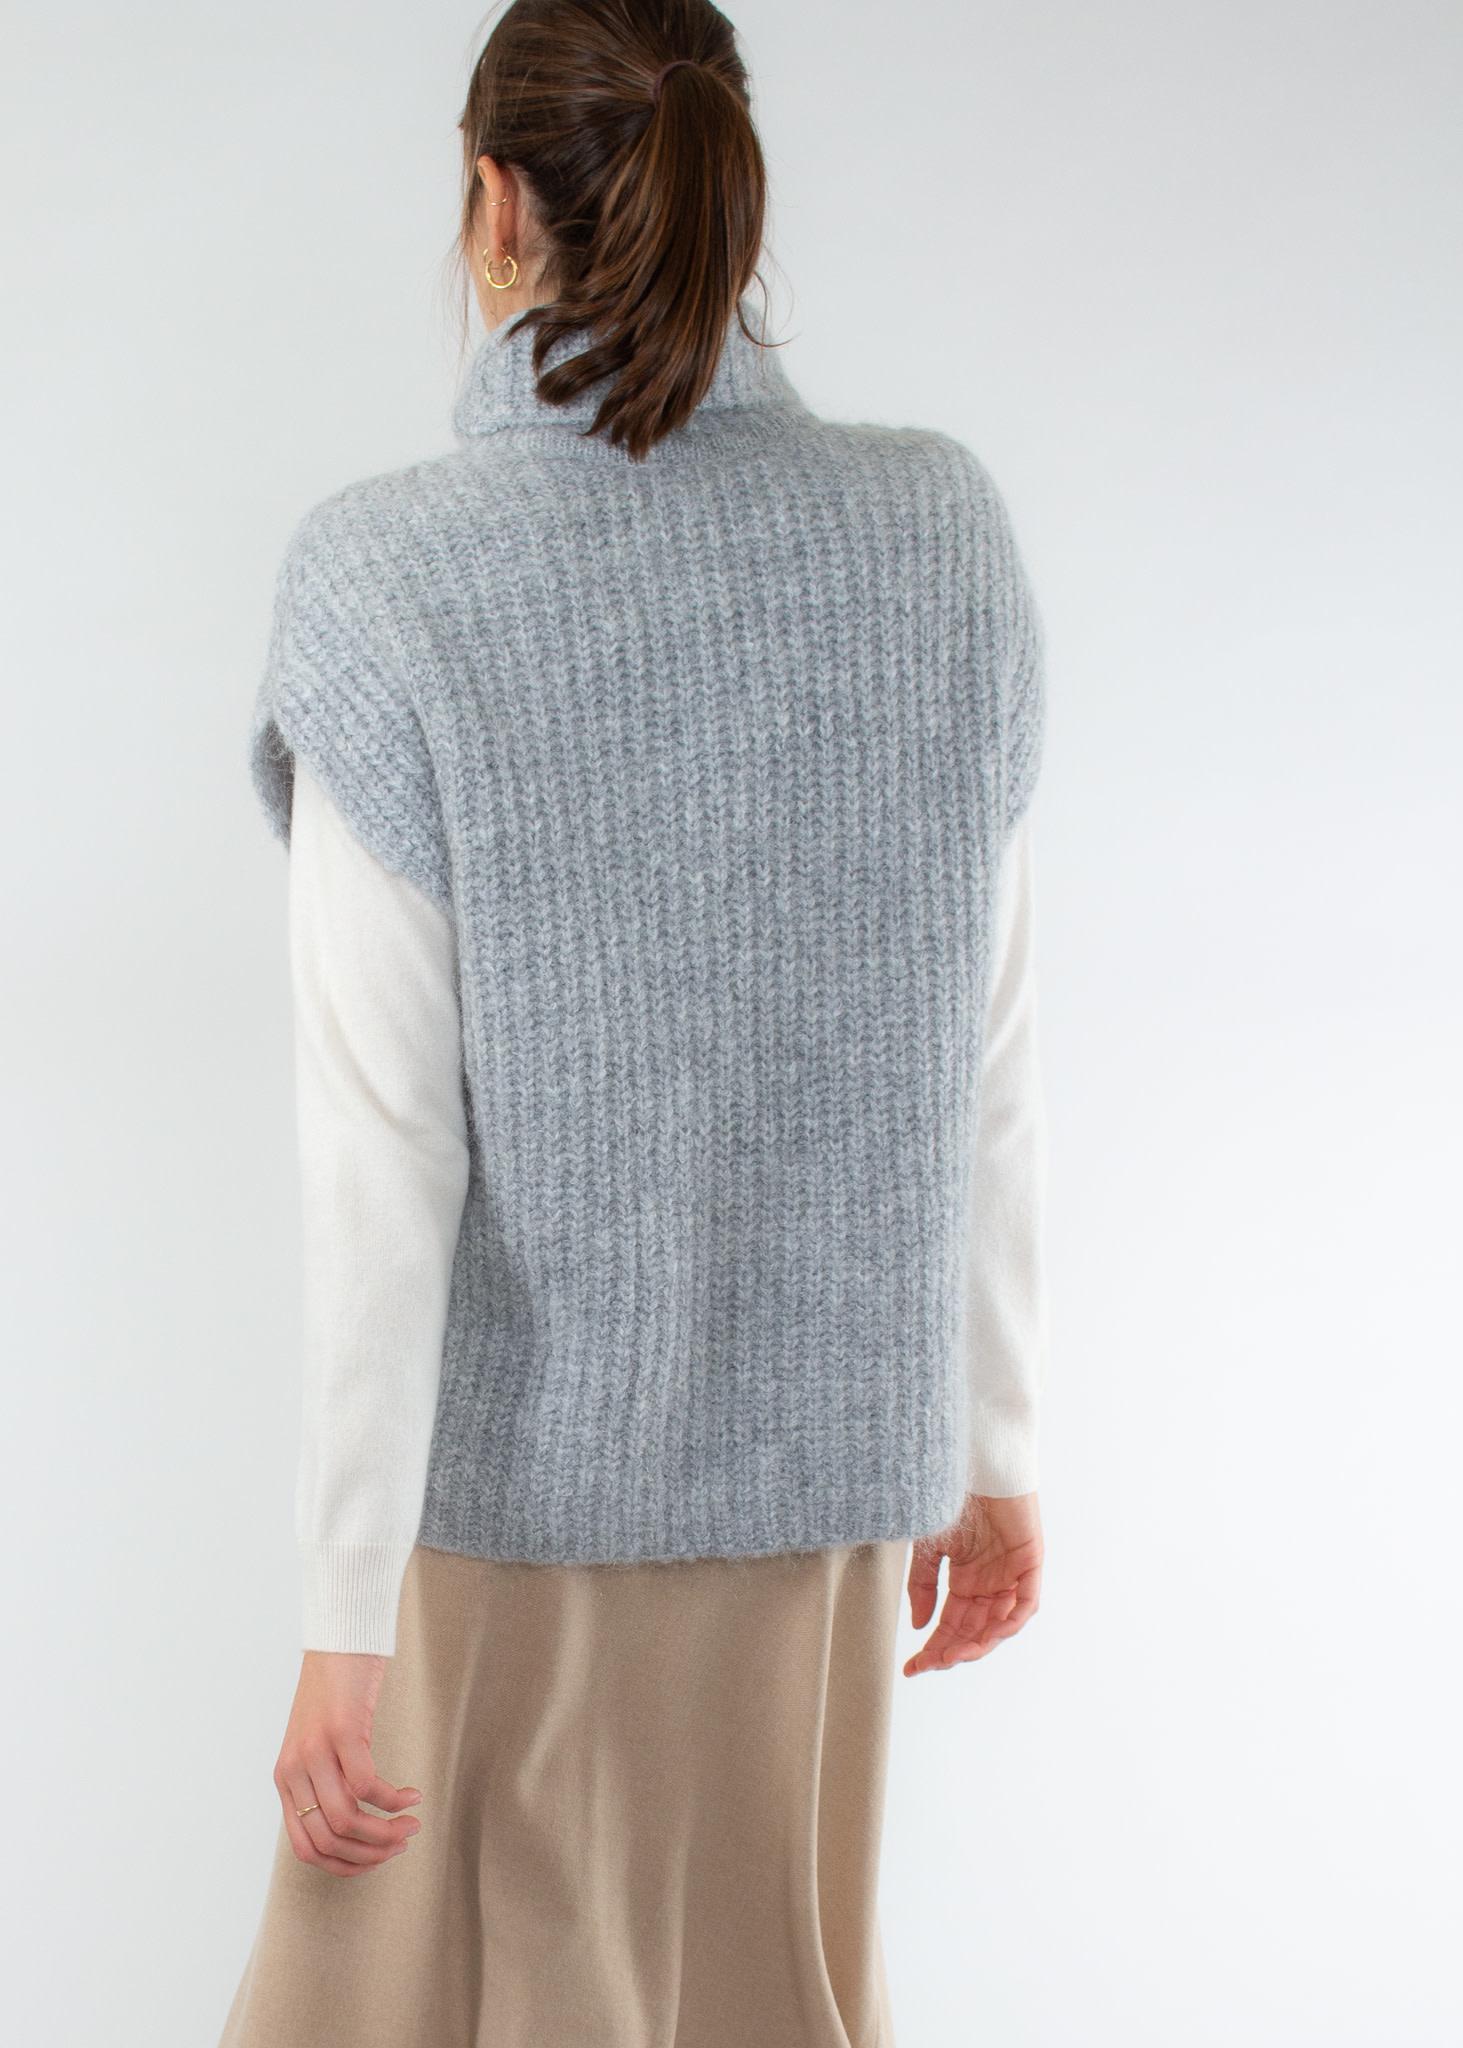 YAYA Throw over knit short poncho